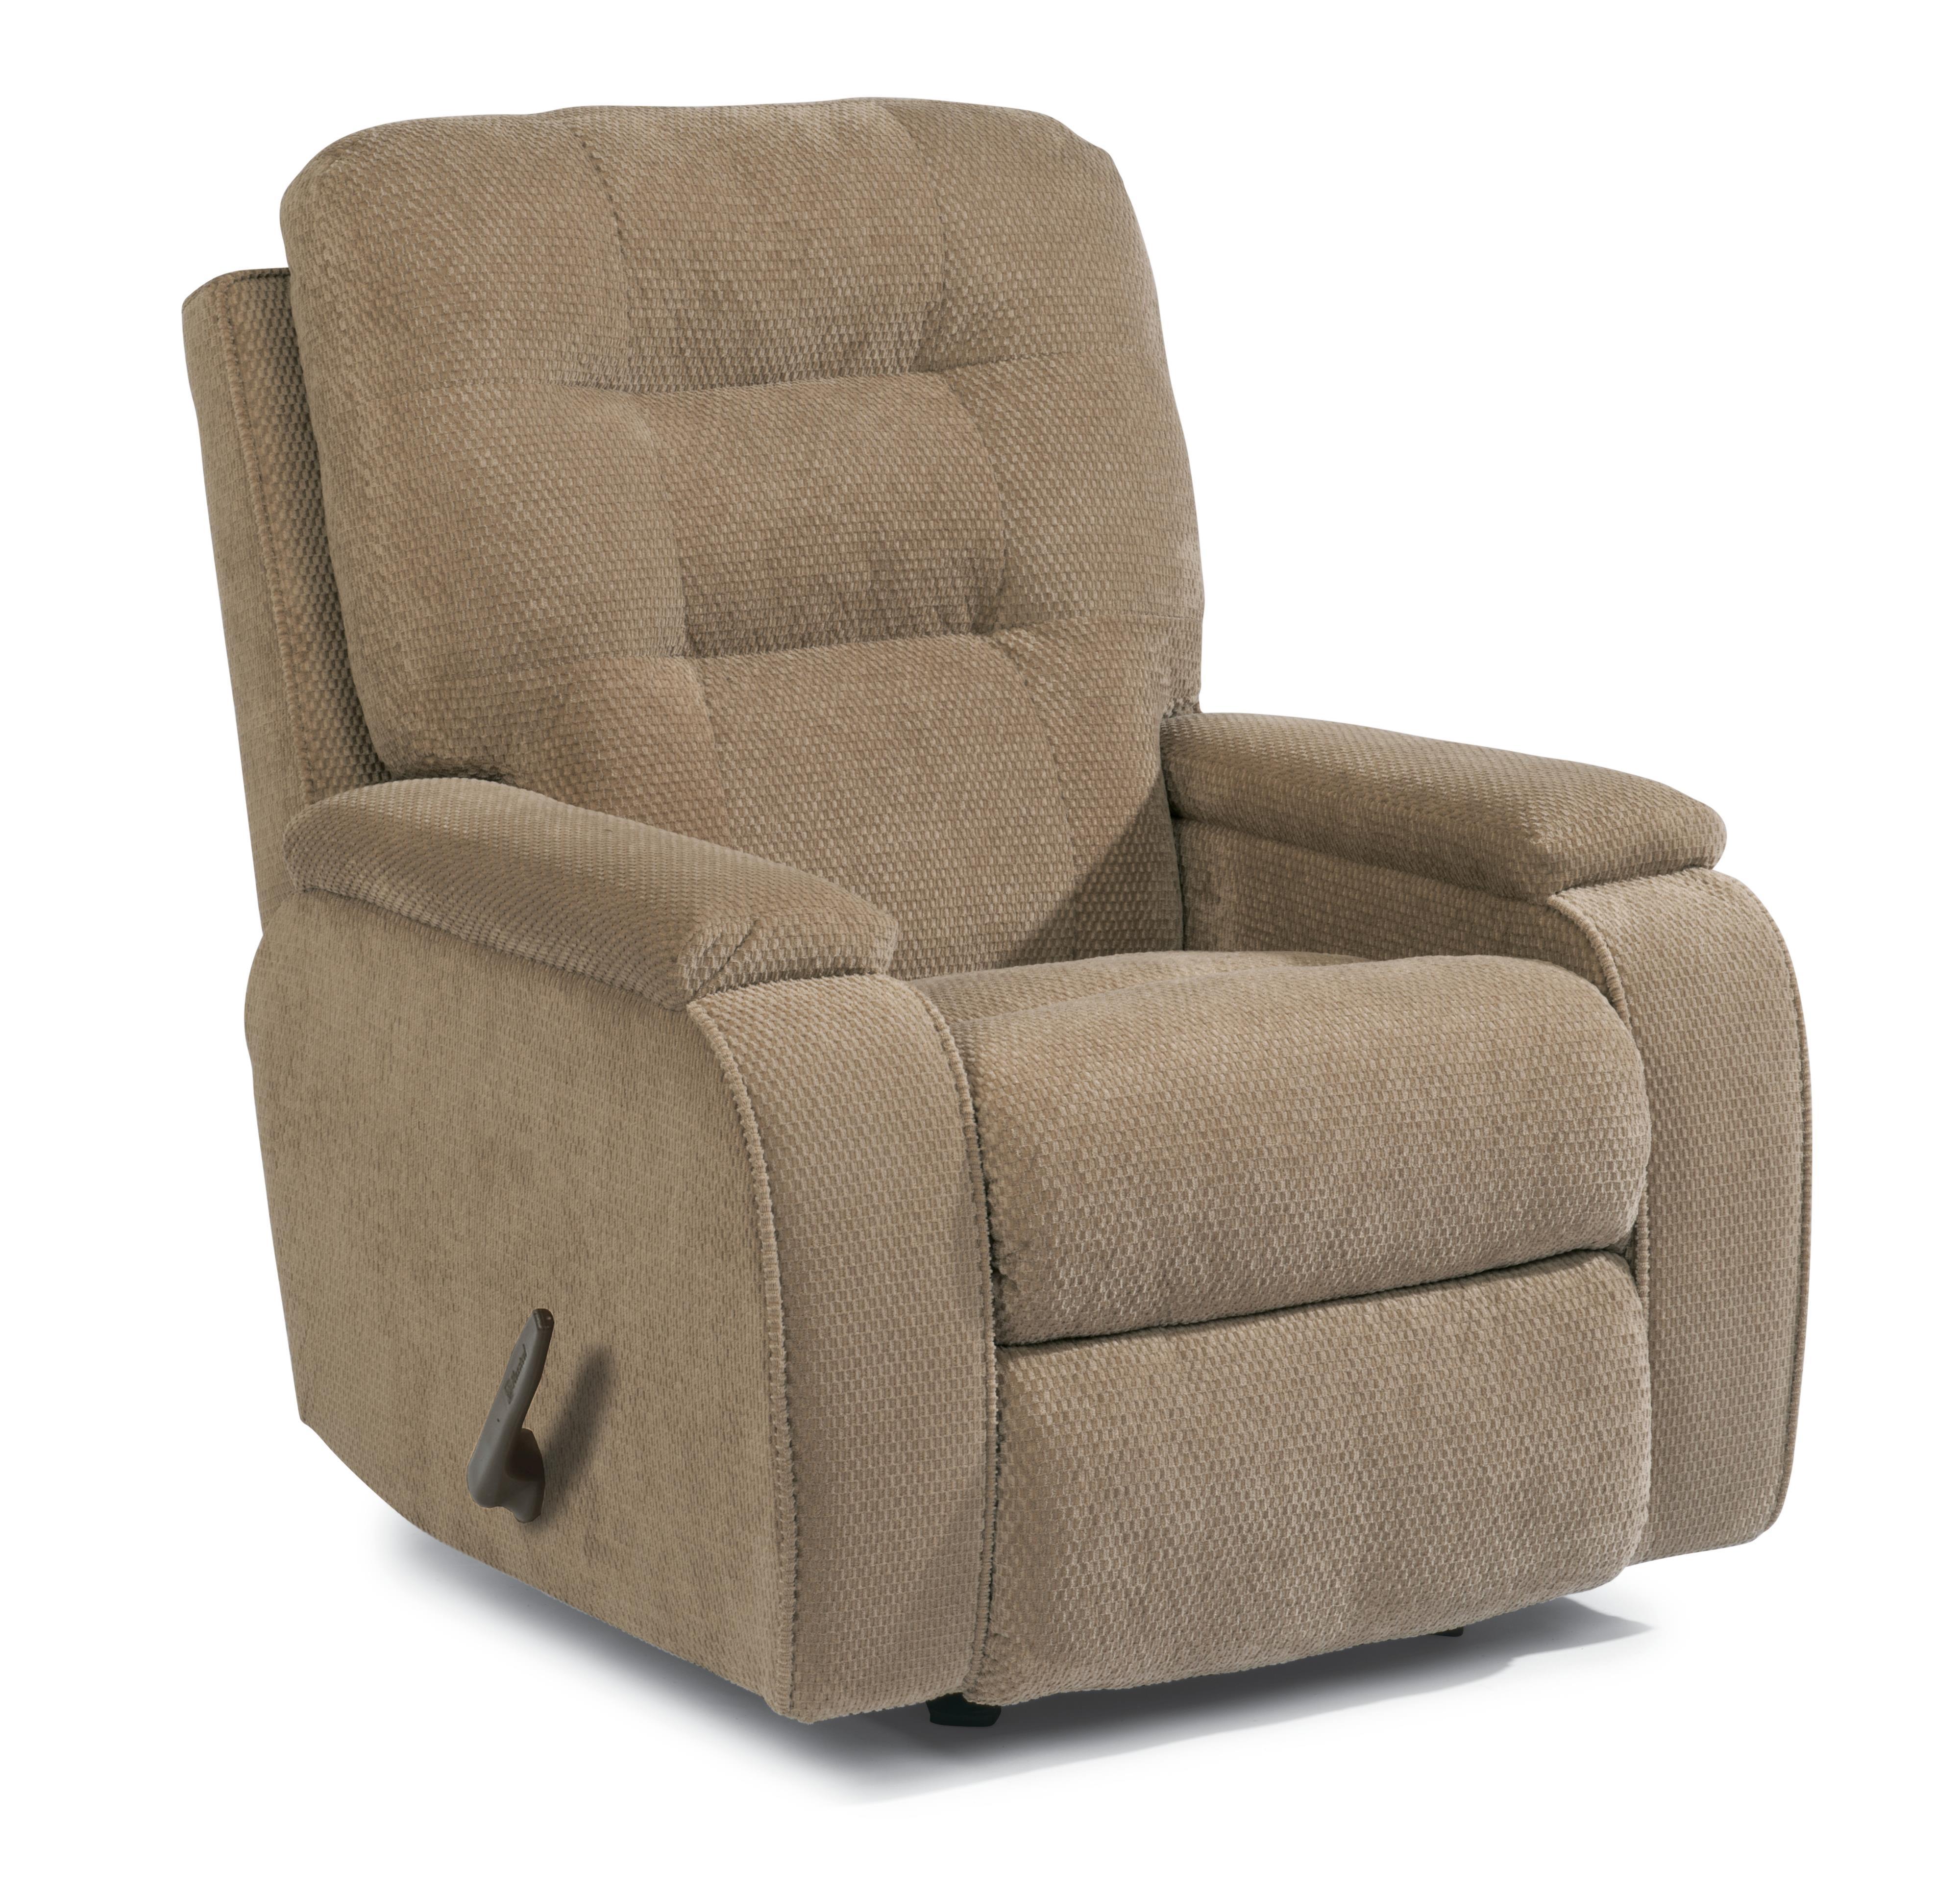 Kerrie Swivel Glider Recliner by Flexsteel at Mueller Furniture